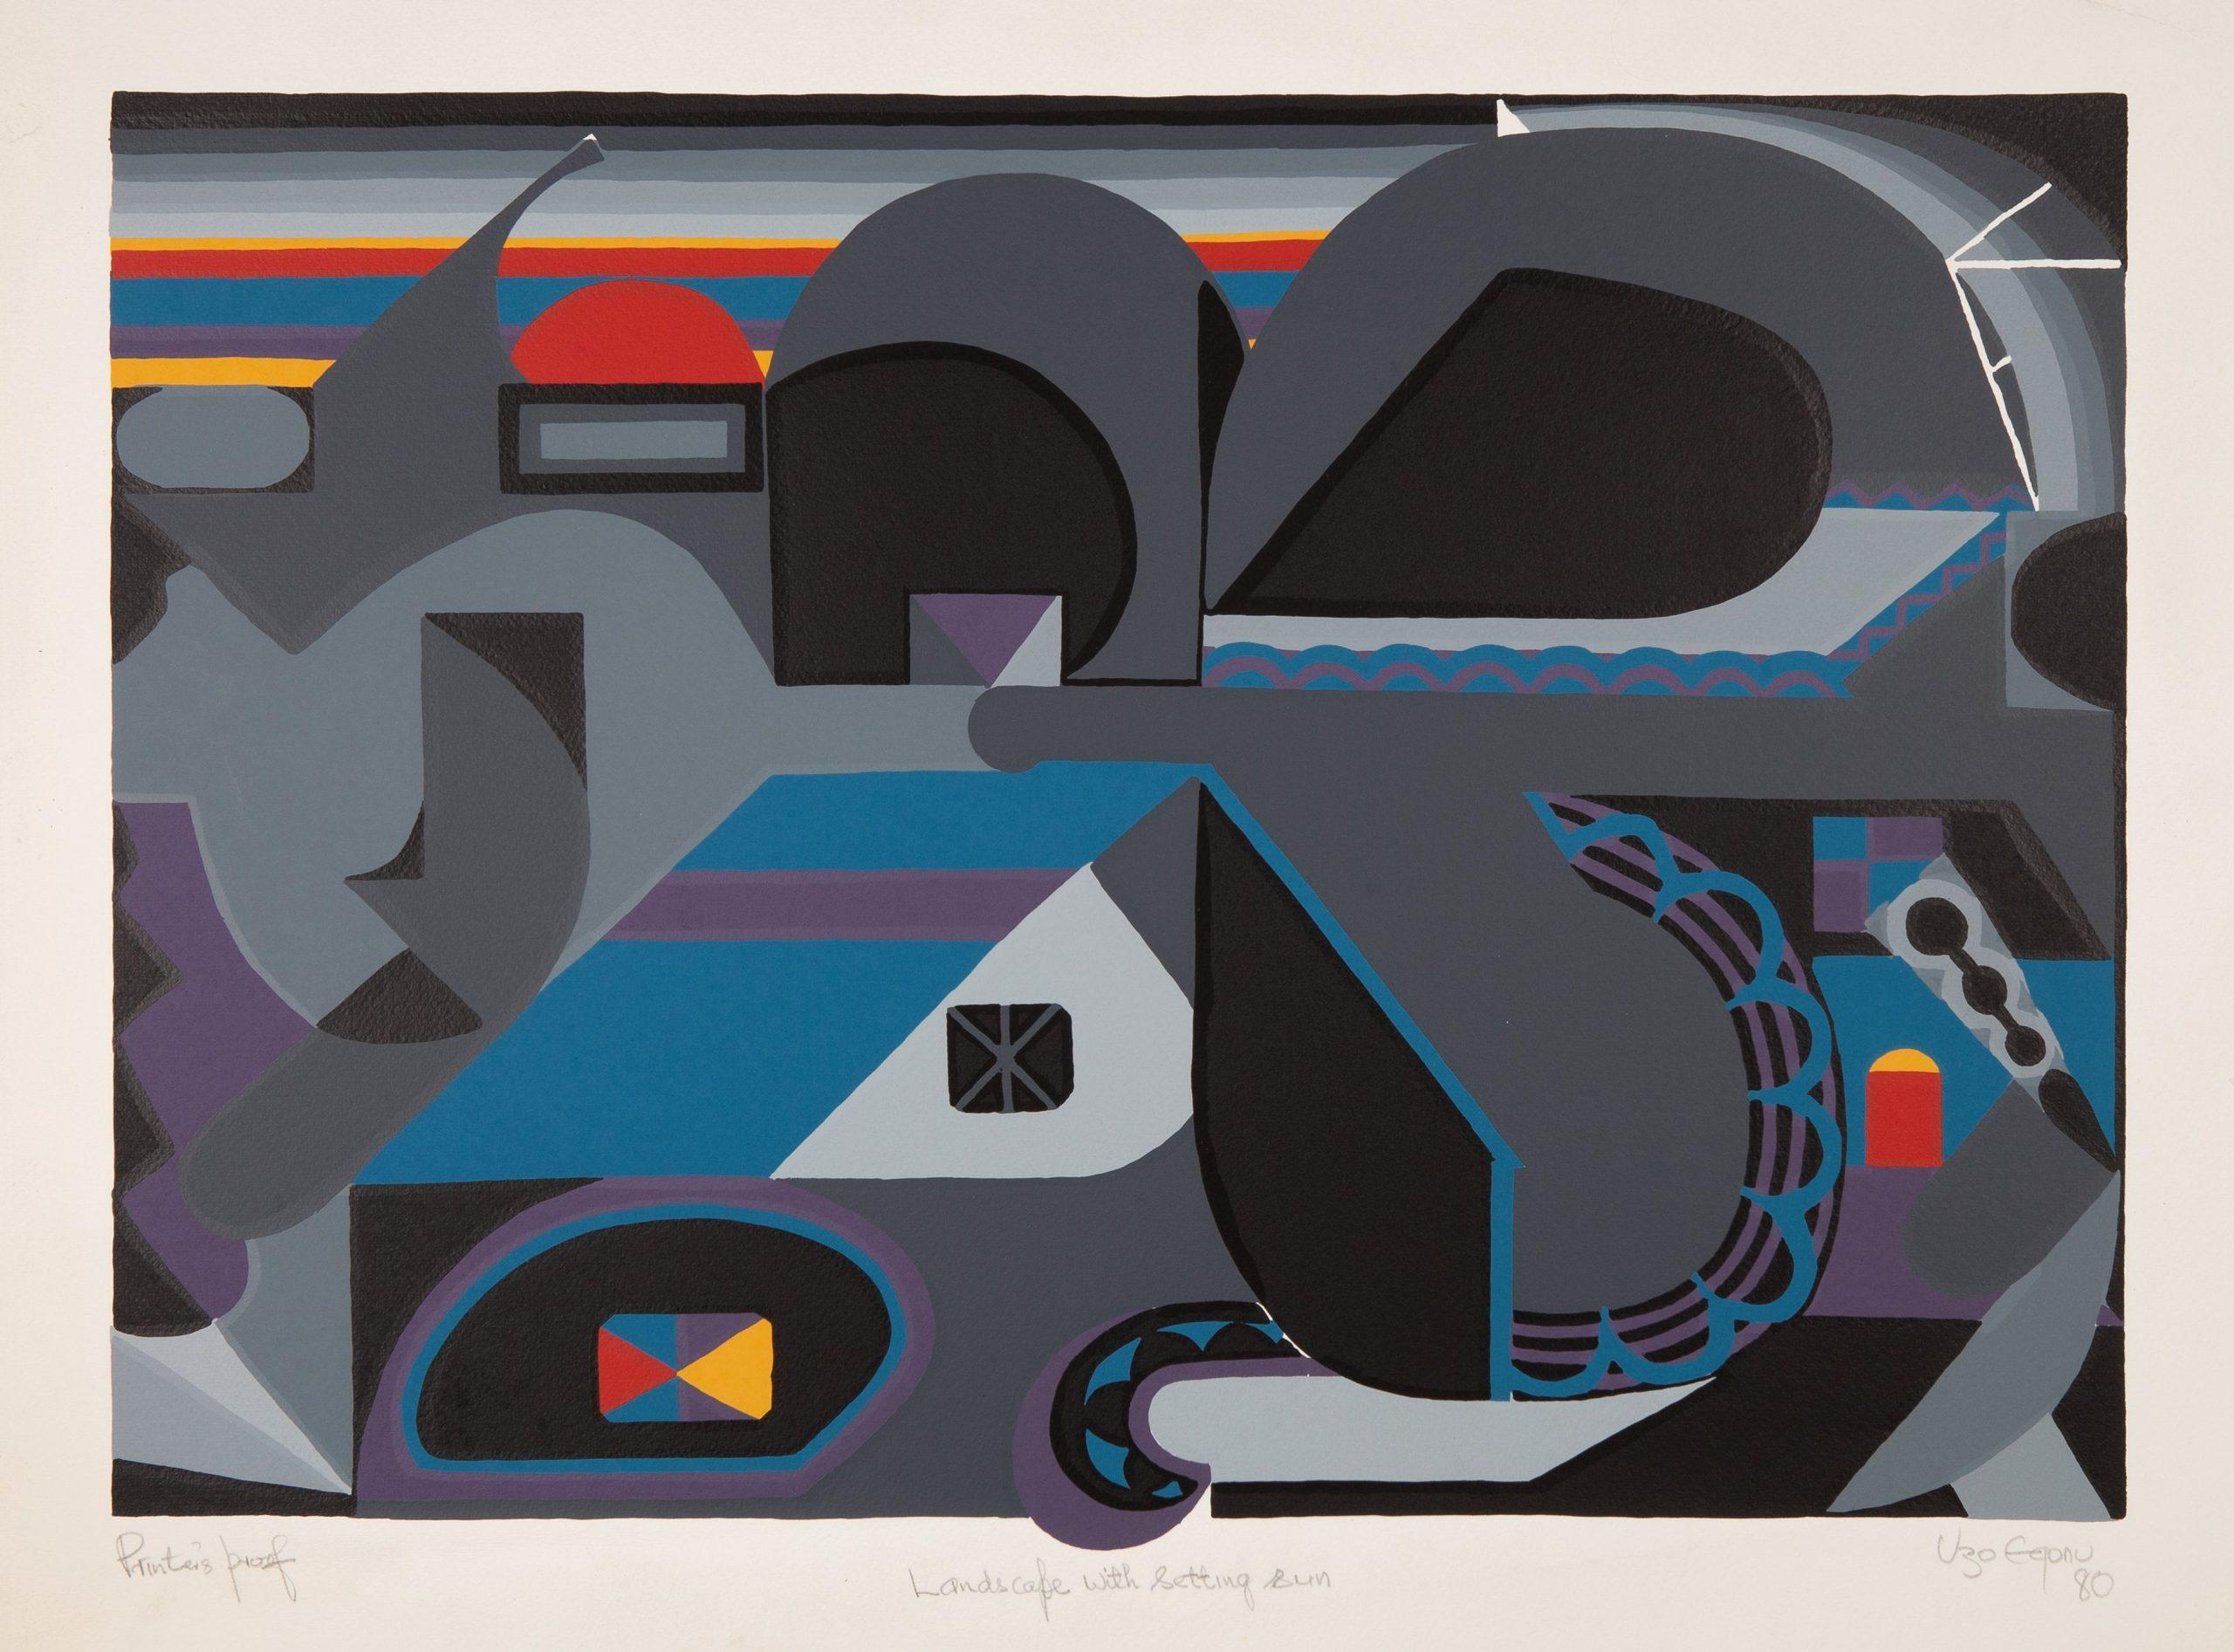 Uzo Egonu - Landscape with setting sun - 1980 - Screenprint on woven paper - 19.8 x 28 in. Printers Proof. Courtesy of Kó